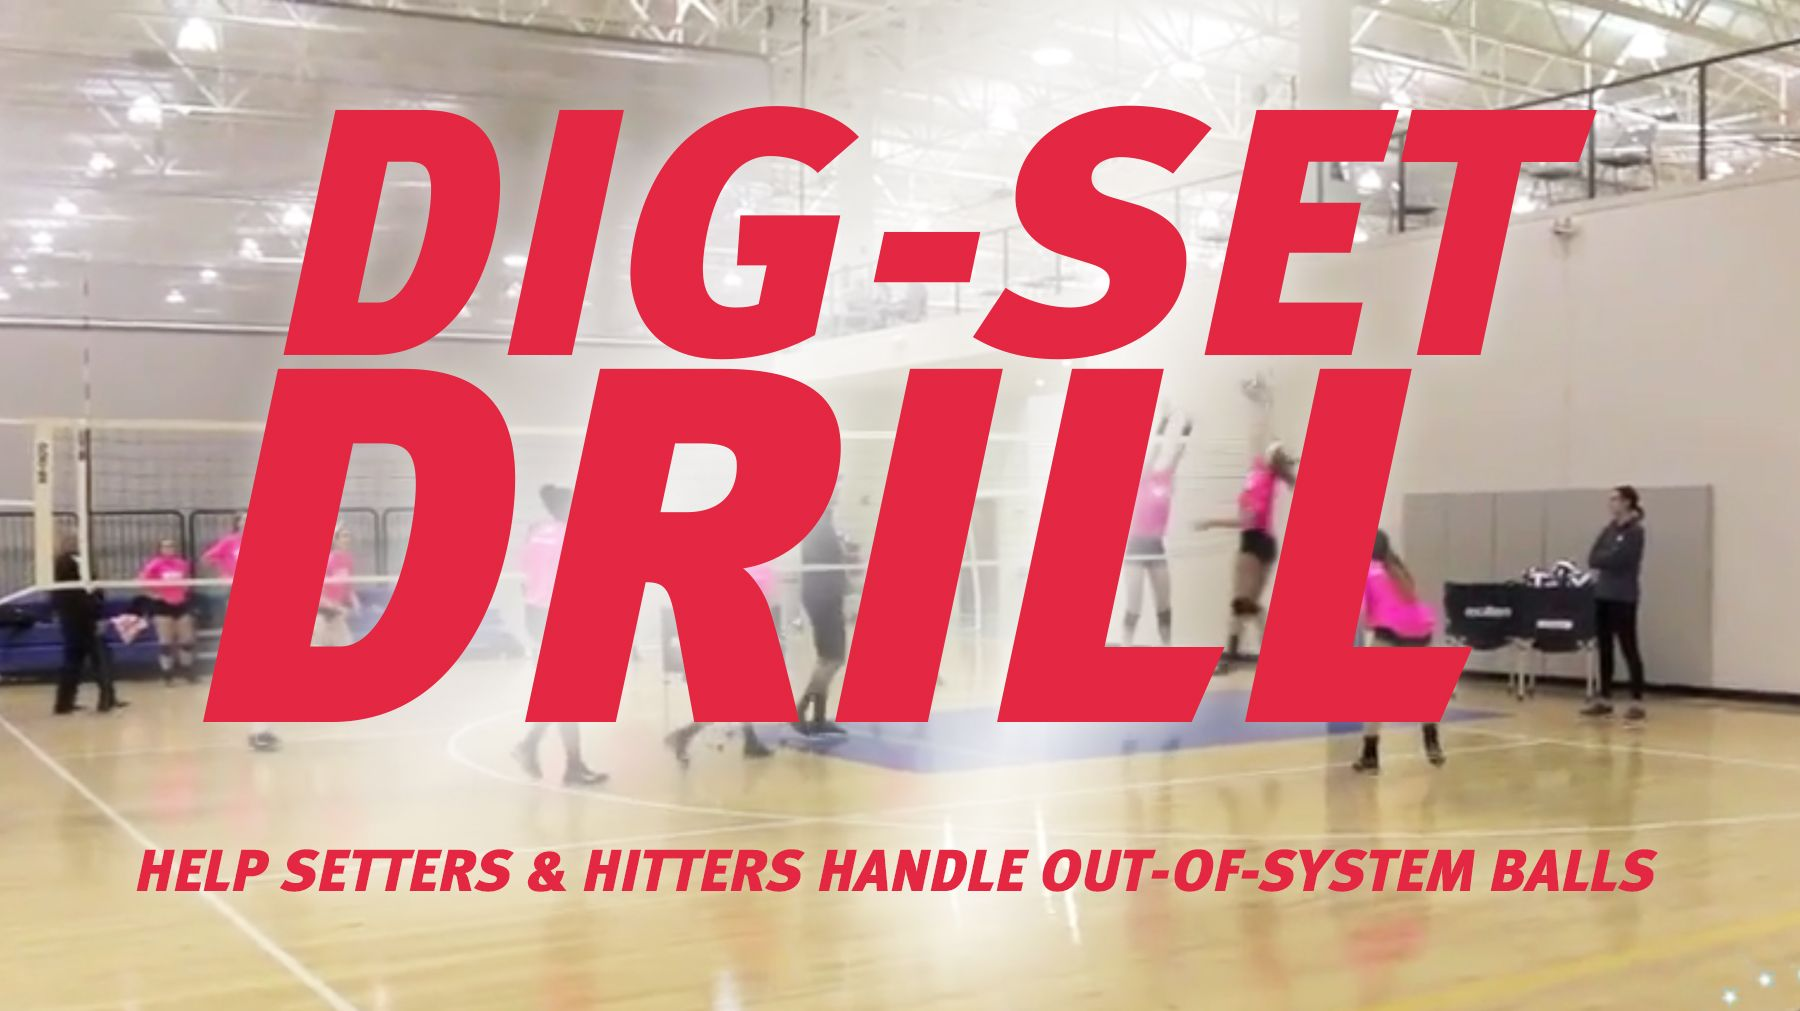 Tav Dig Set Drill The Art Of Coaching Volleyball Volleyball Drills For Beginners Coaching Volleyball Volleyball Drills